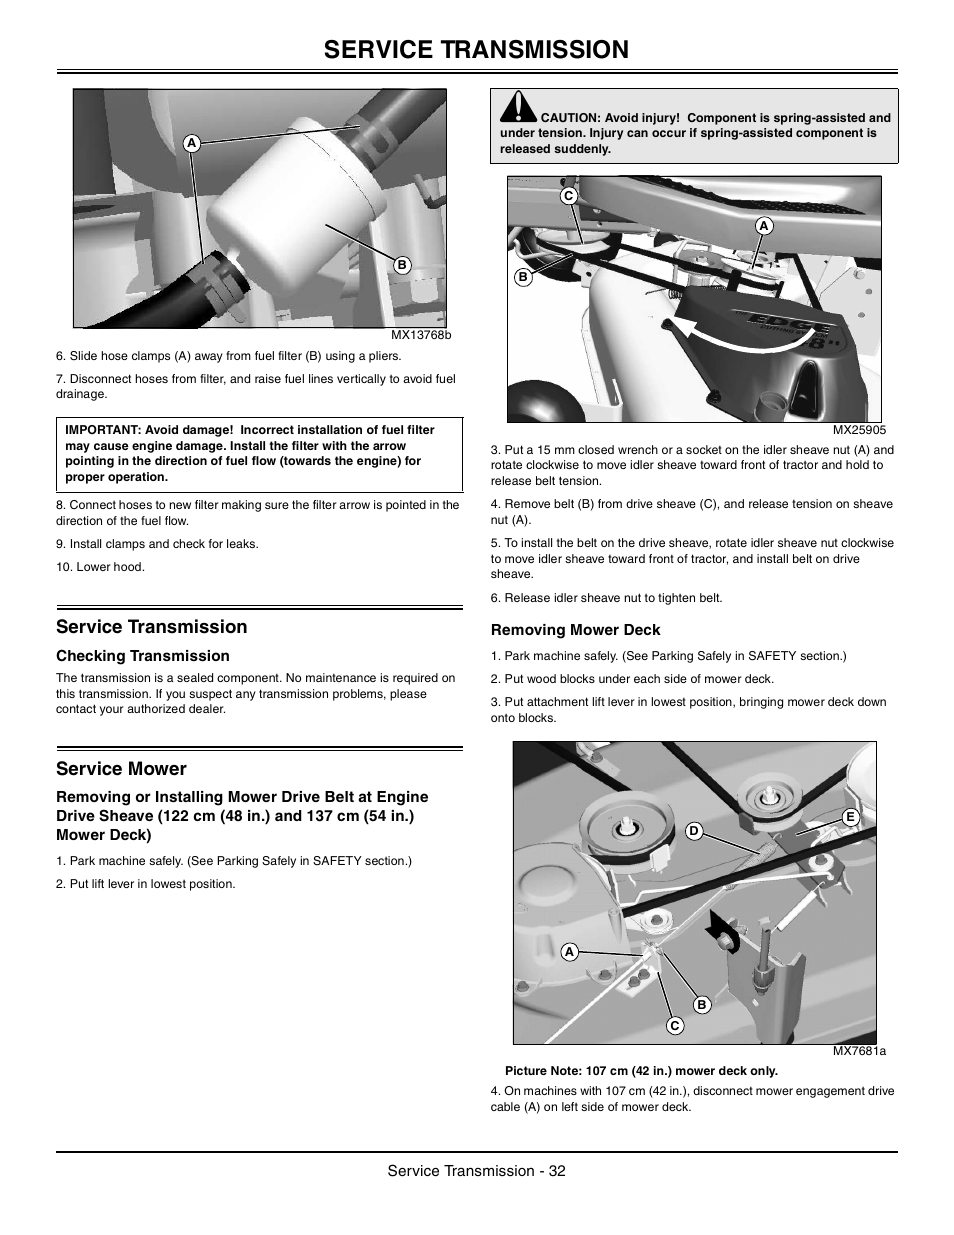 Service Transmission  Checking Transmission  Service Mower